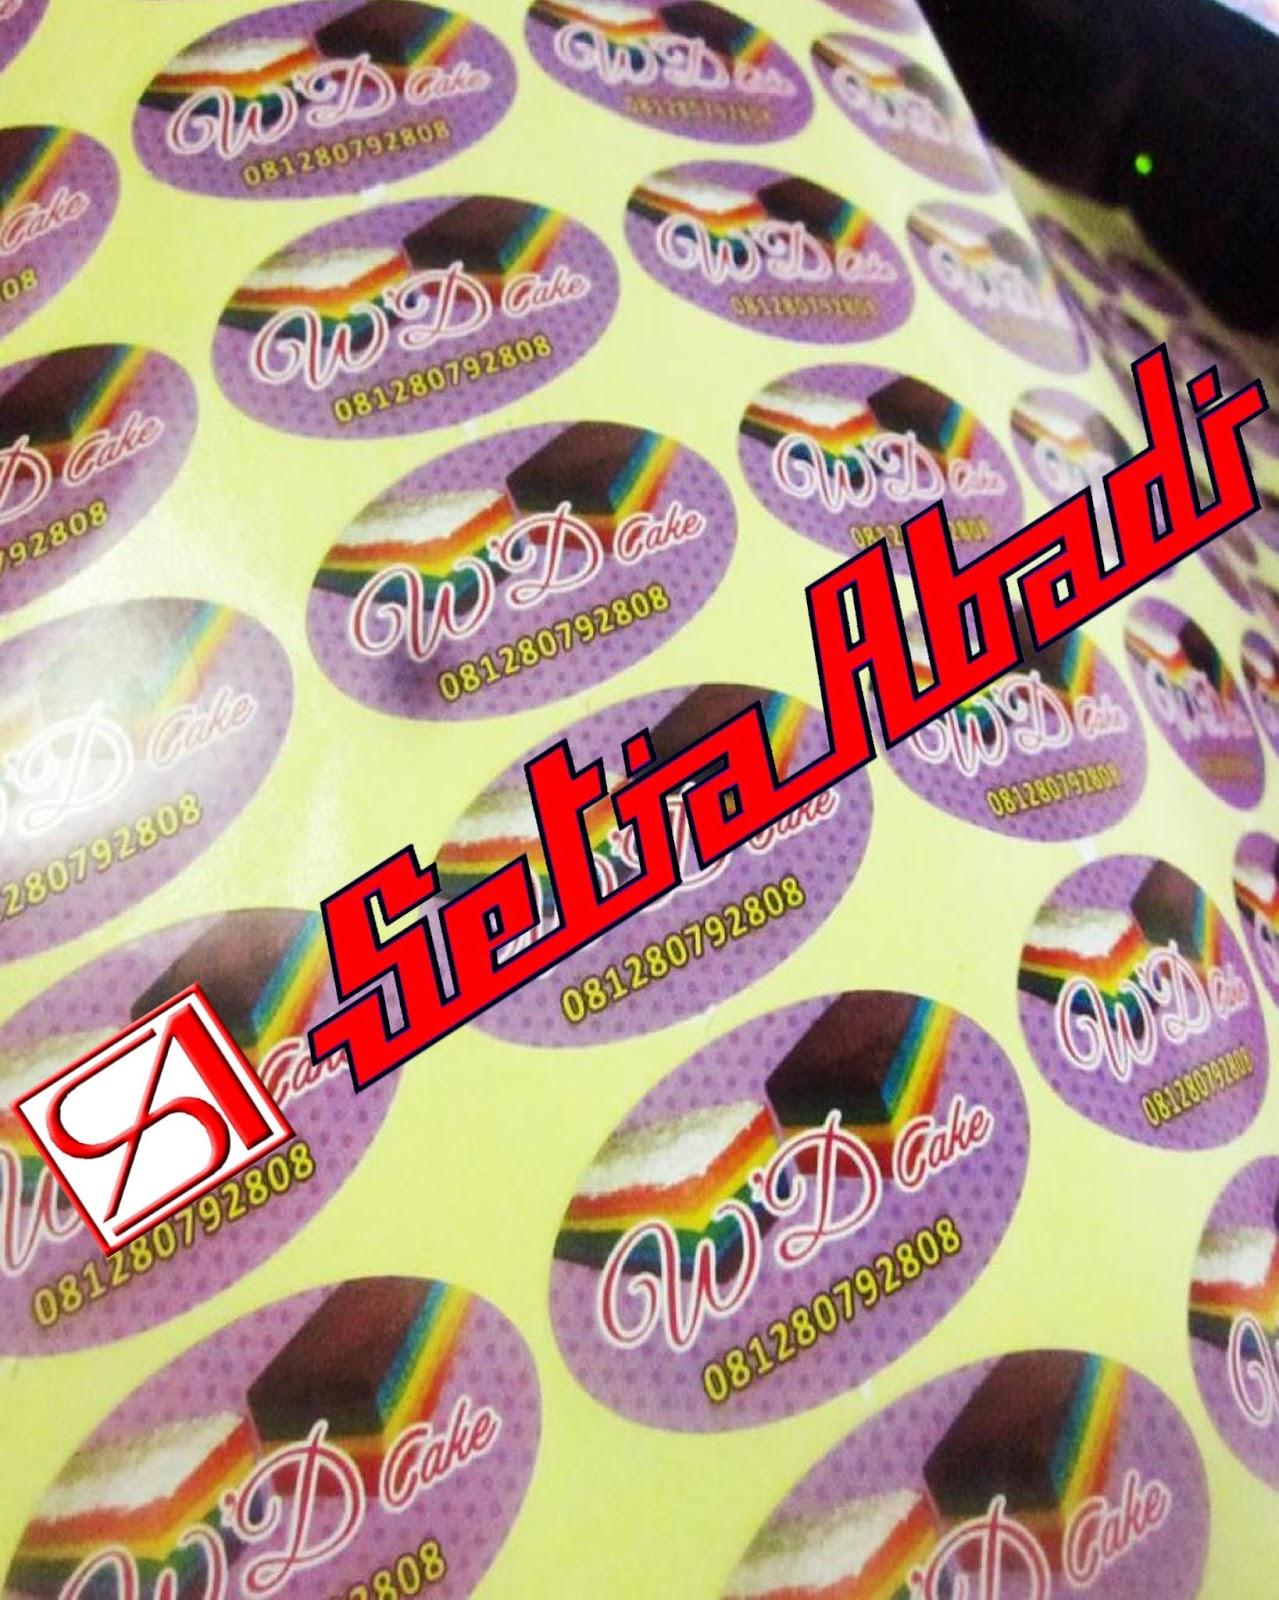 https://www.offsetprinting21.com/2019/01/jasa-cetak-stiker-cromo-di-Jakarta.html